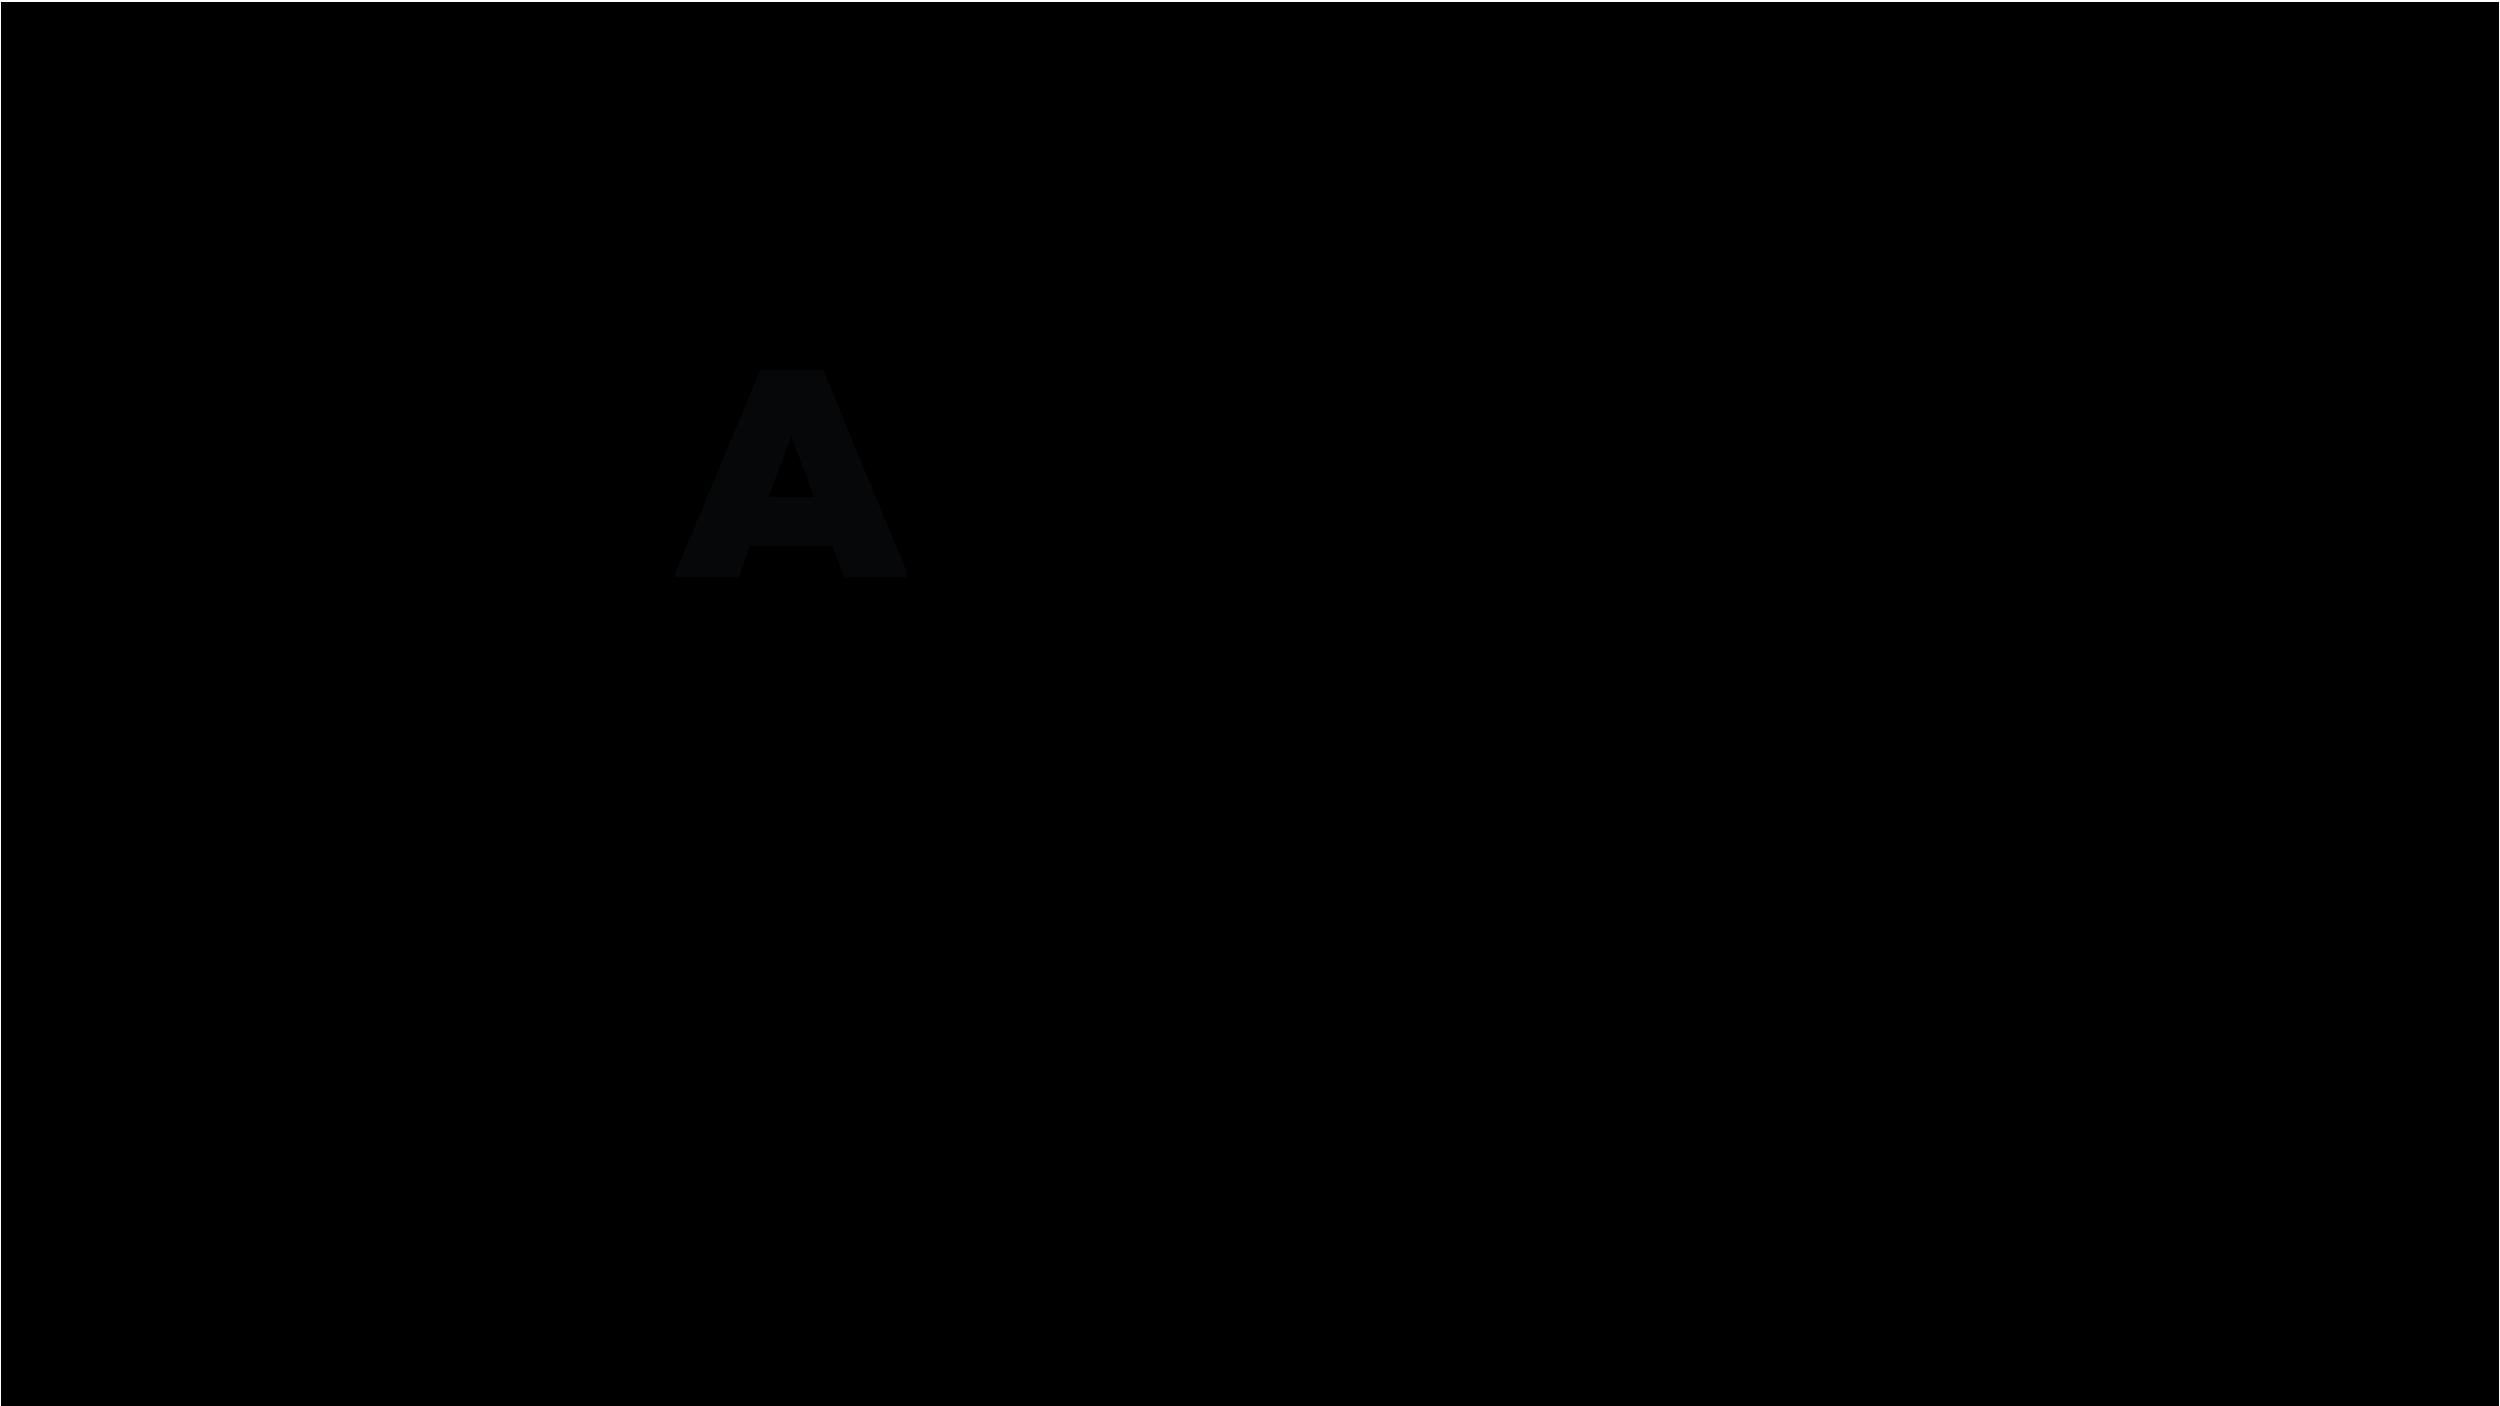 Career relaunch logo b&w.png